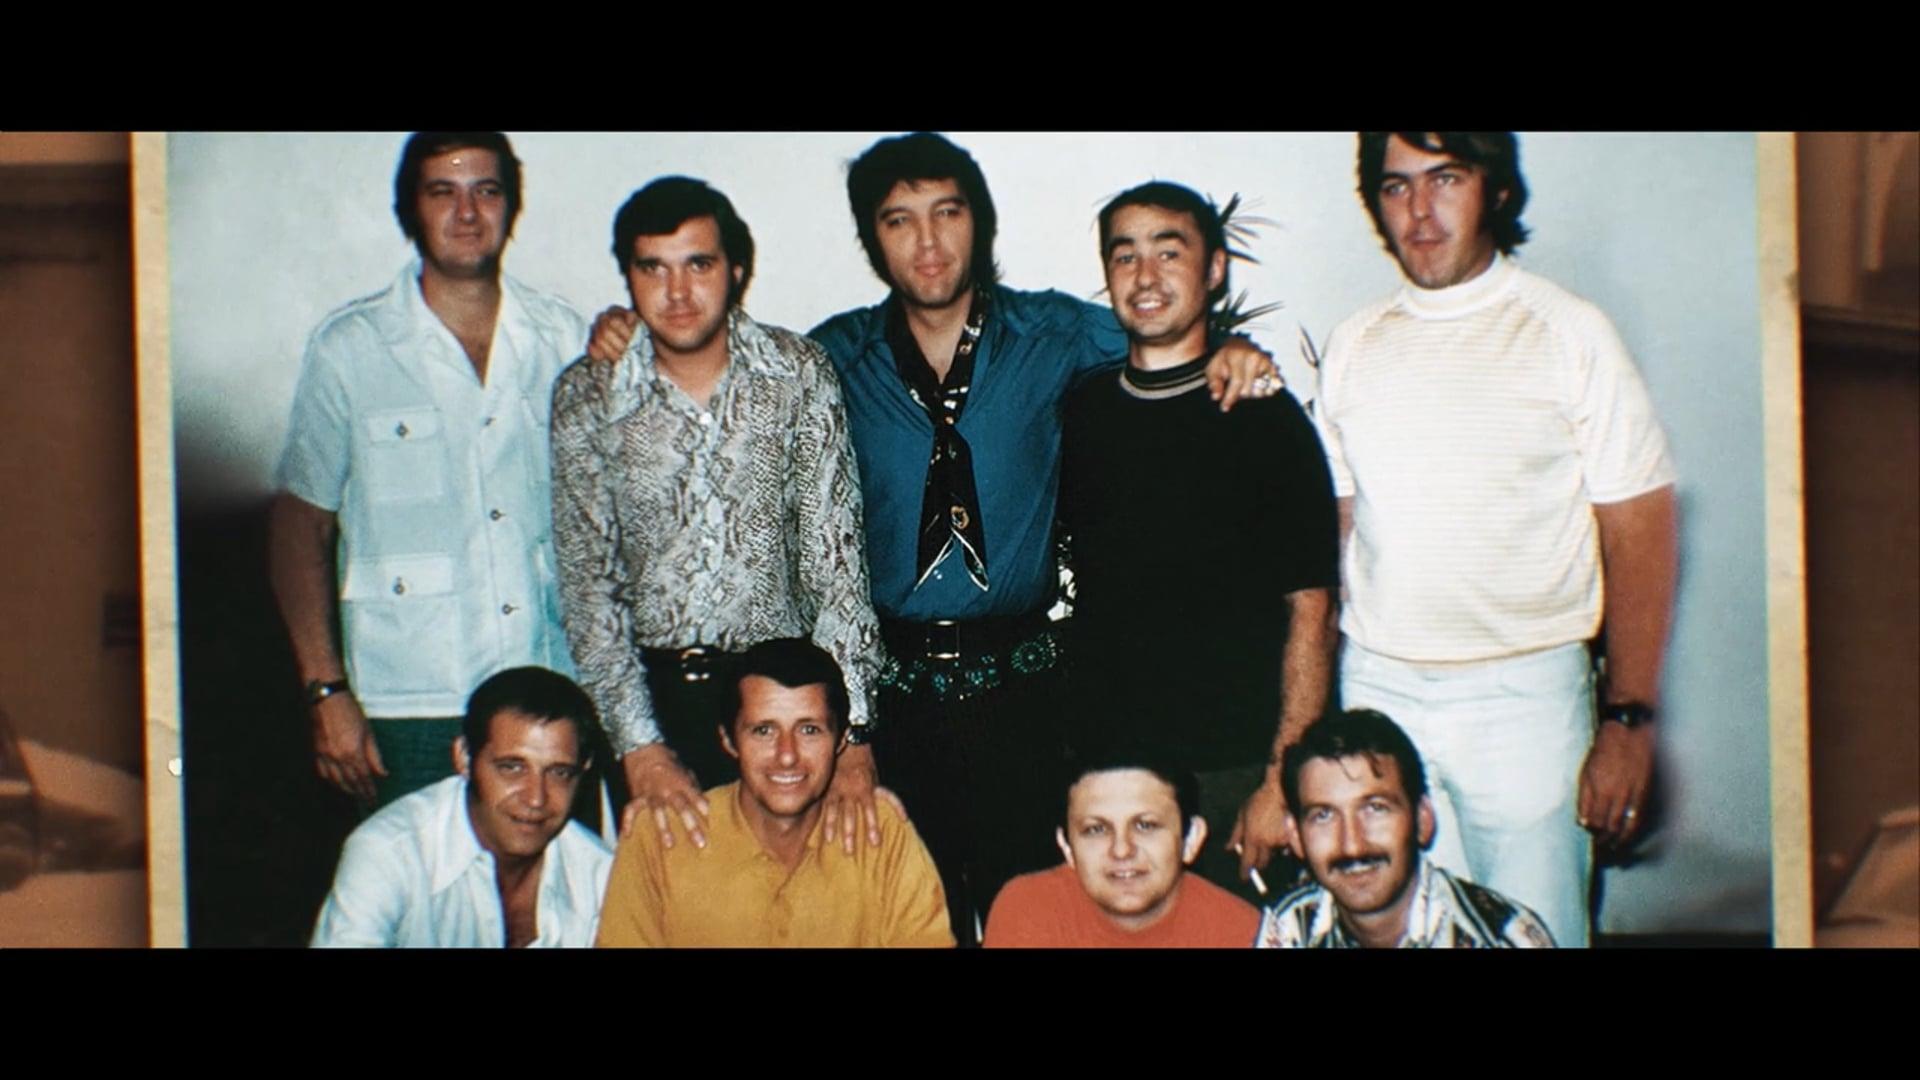 SONY - From Elvis in Nashville